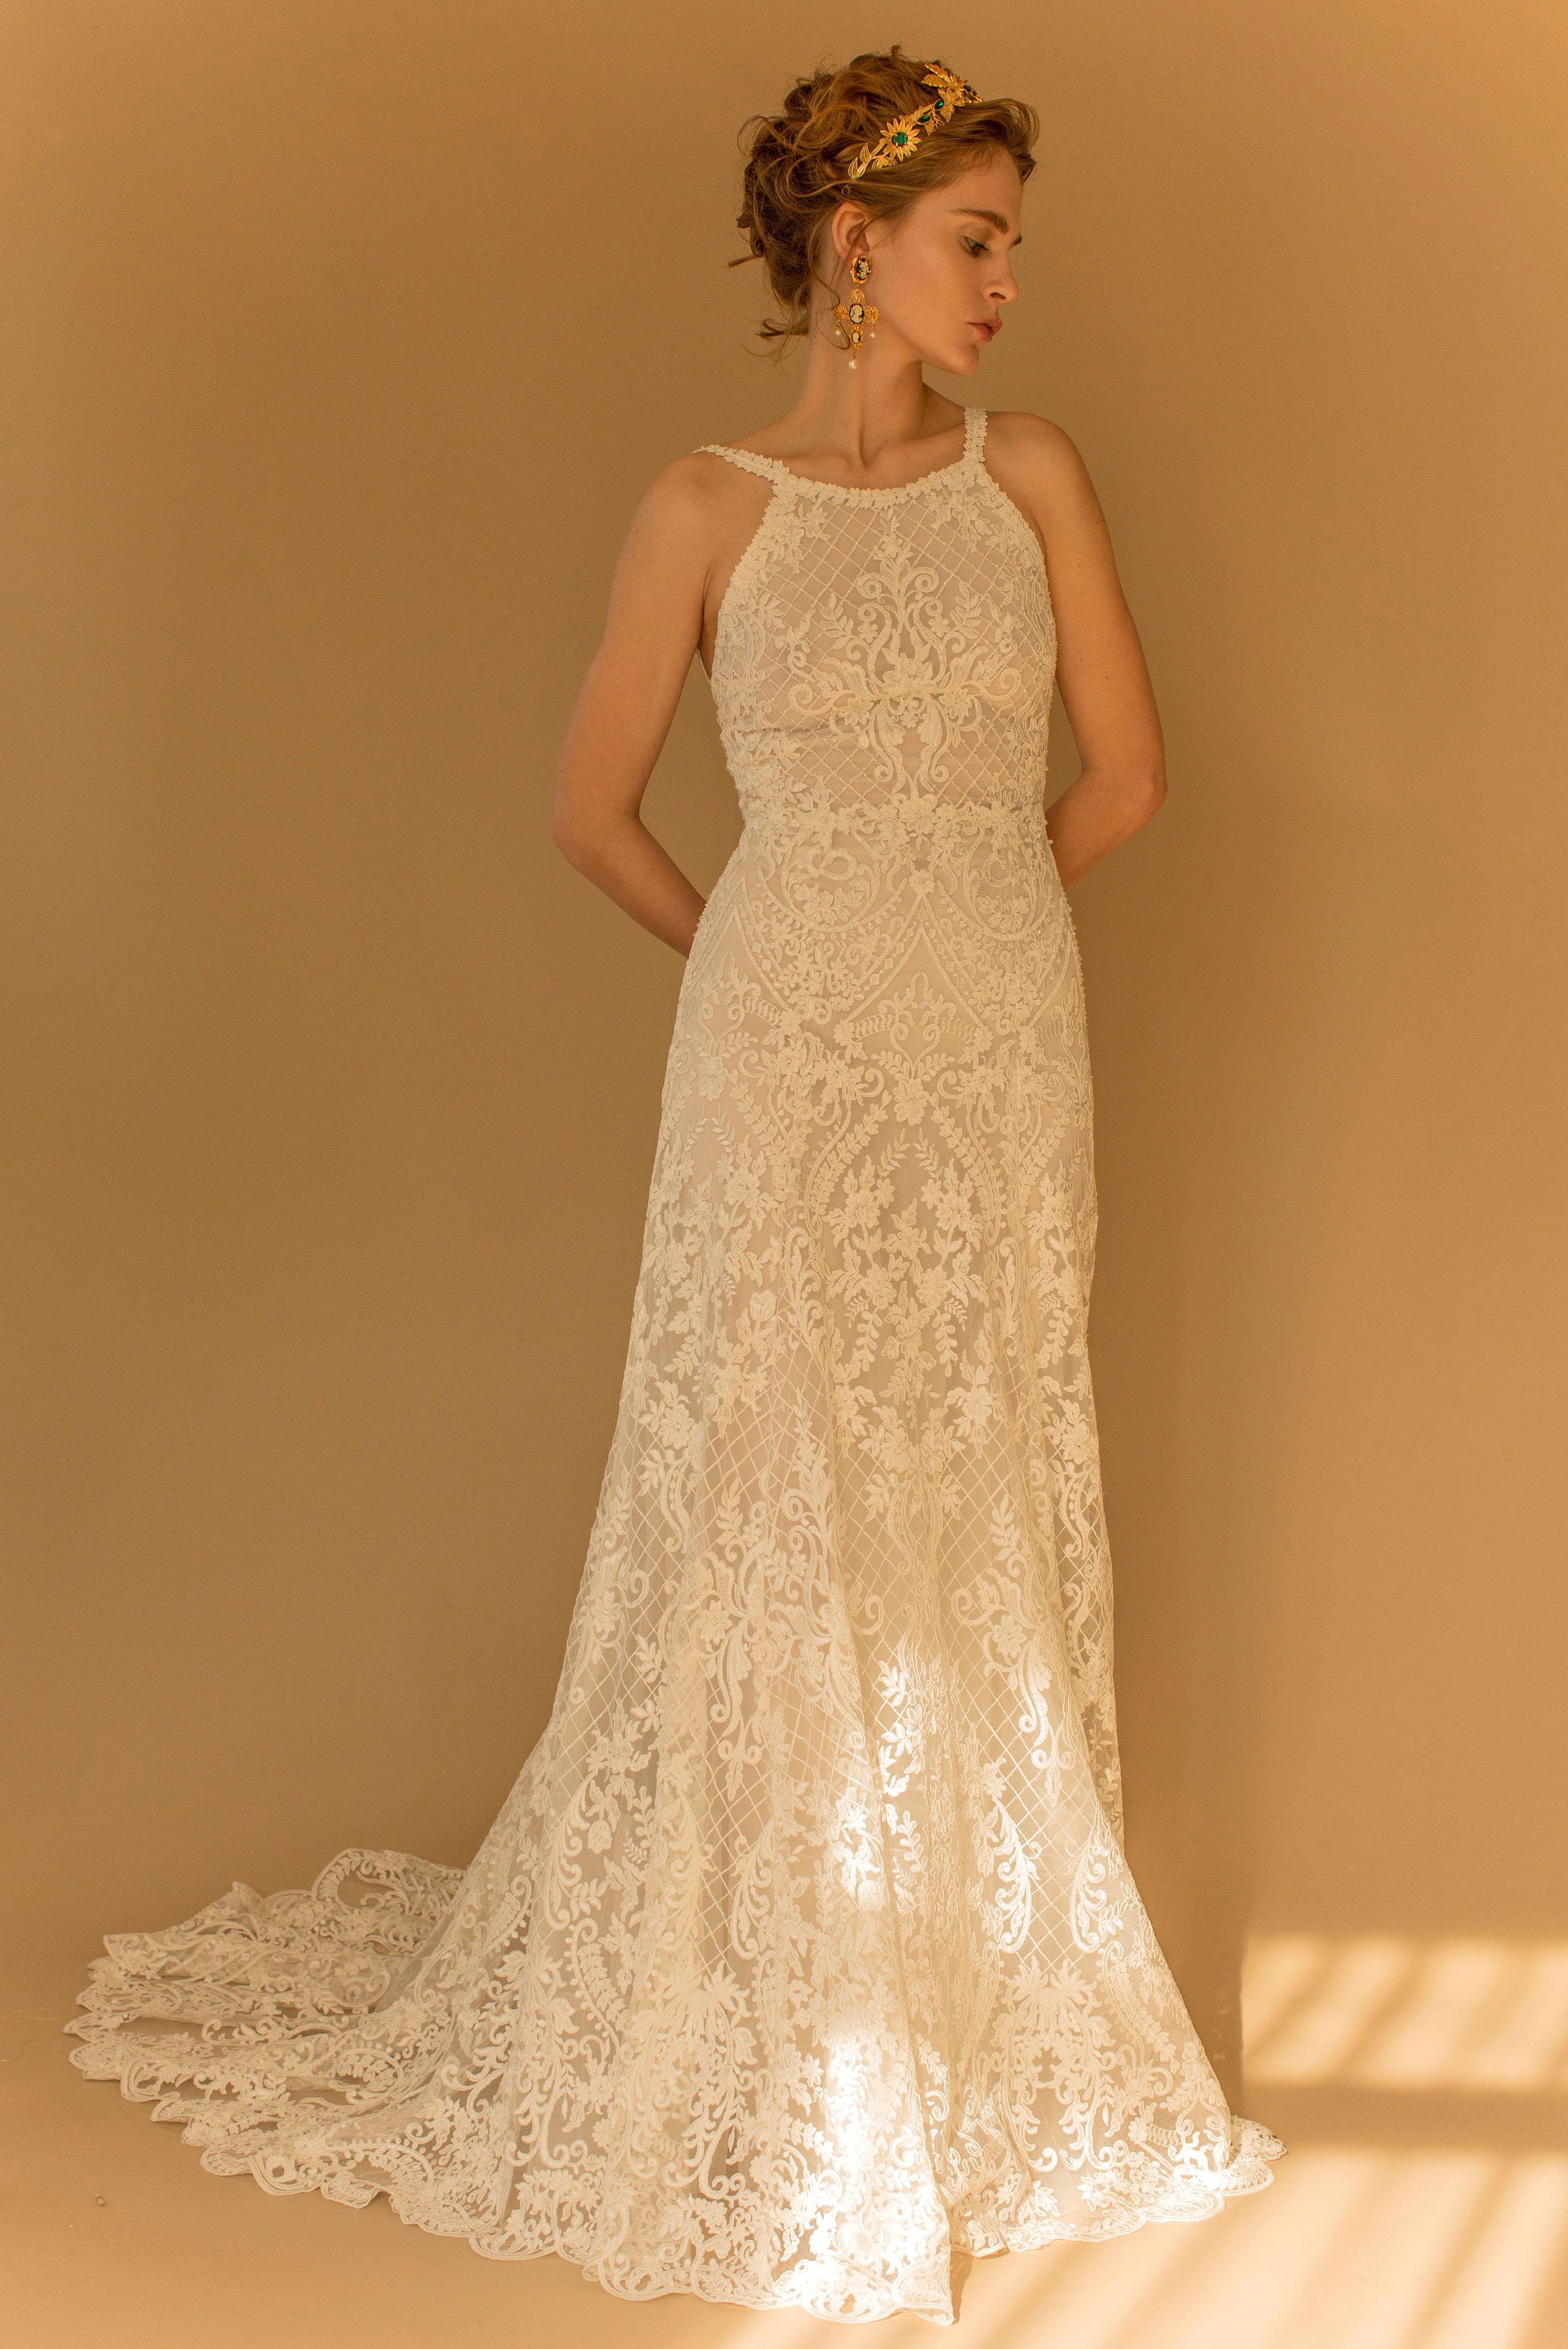 francesca miranda wedding dress fall 2018 lace high neck a-line